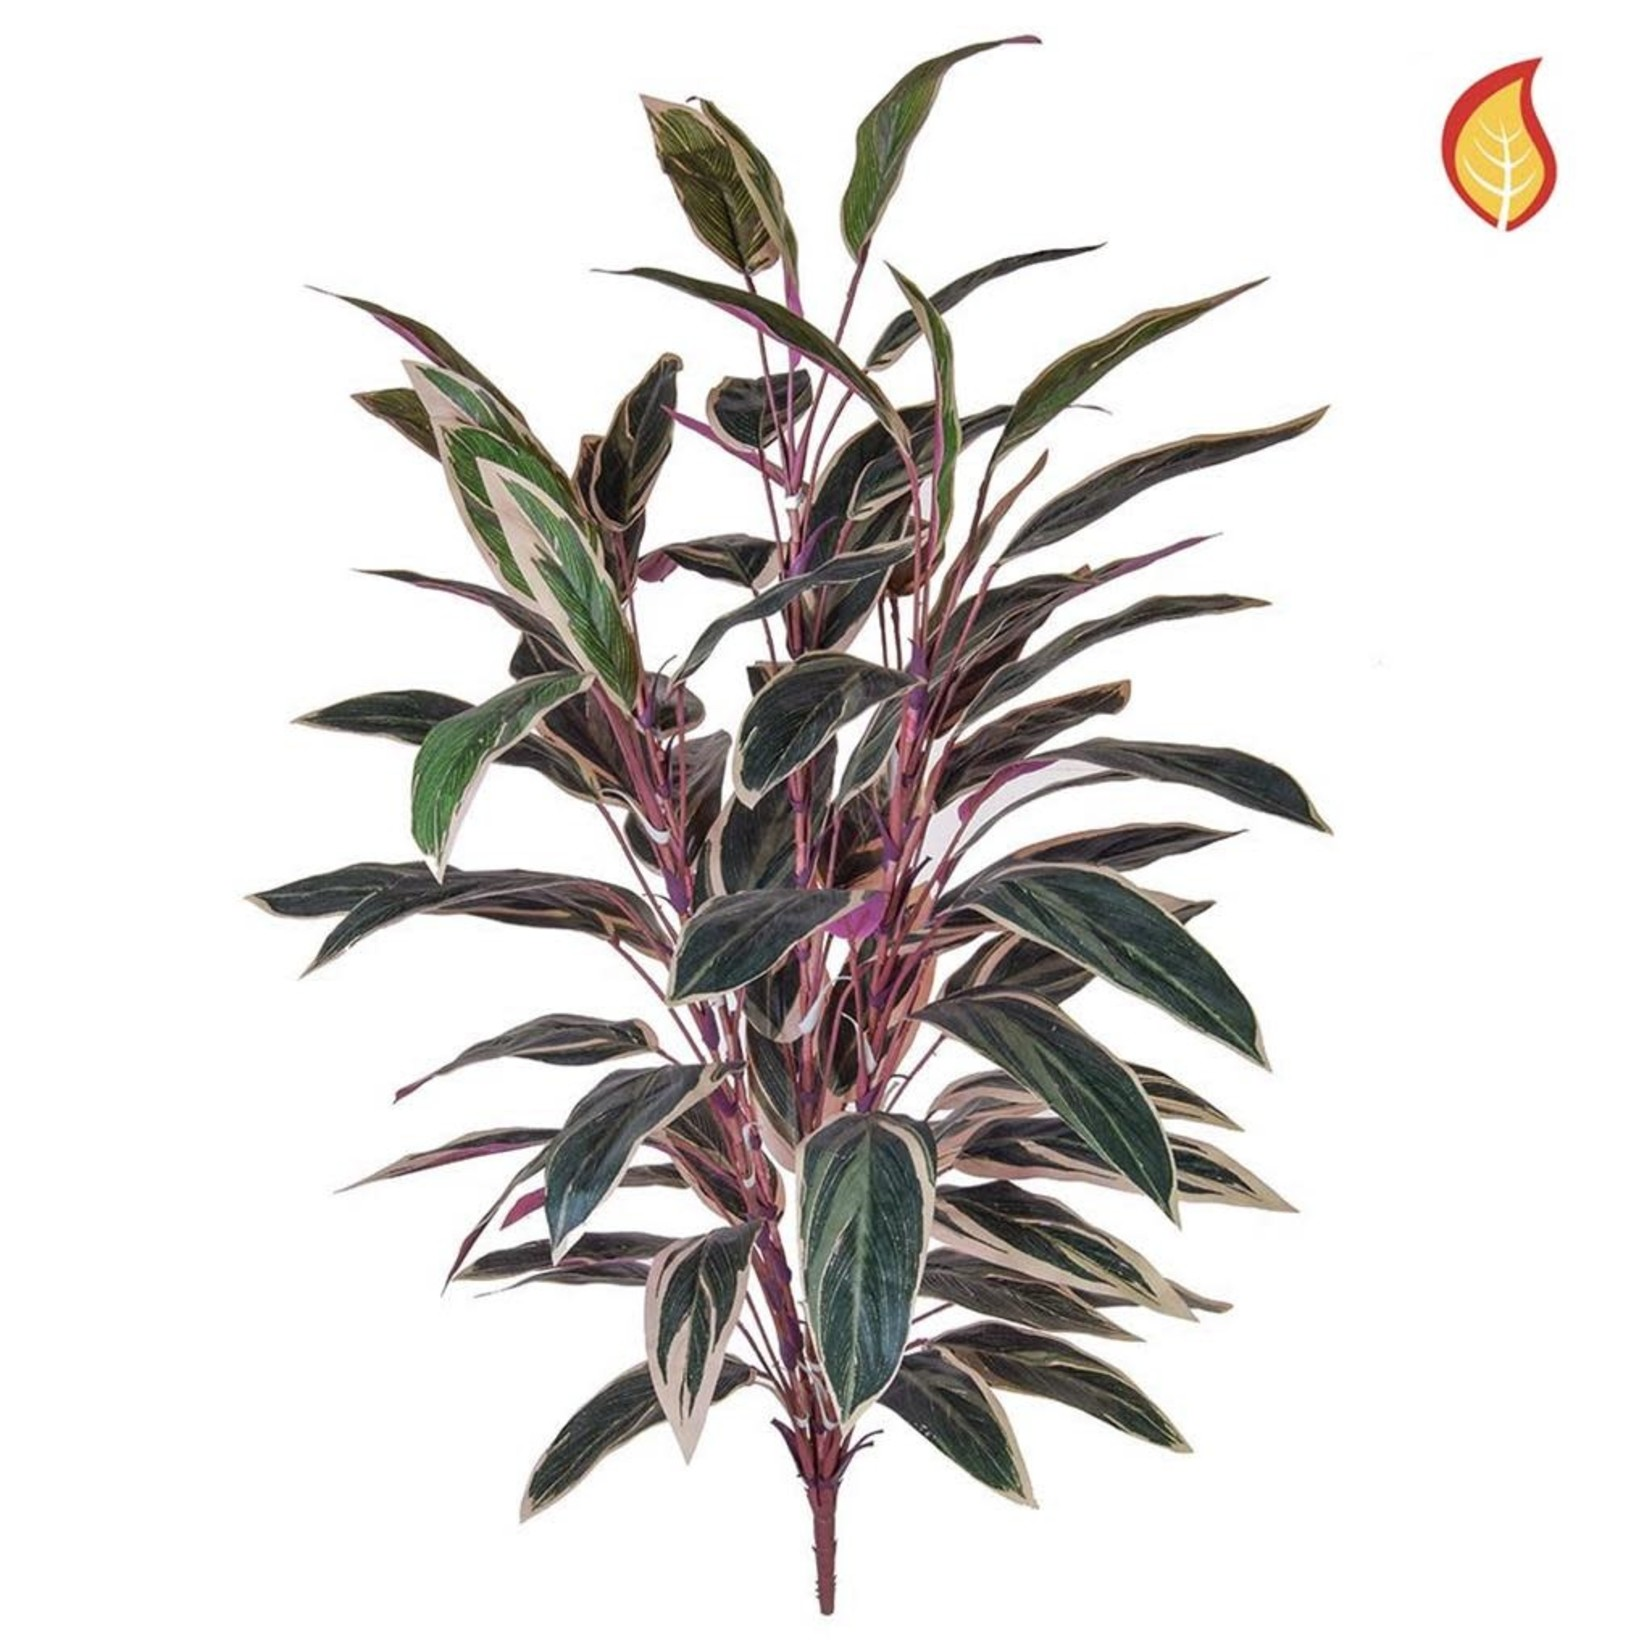 Plants Caladium Bush Green / Pink 85cm SF - Fire Rated